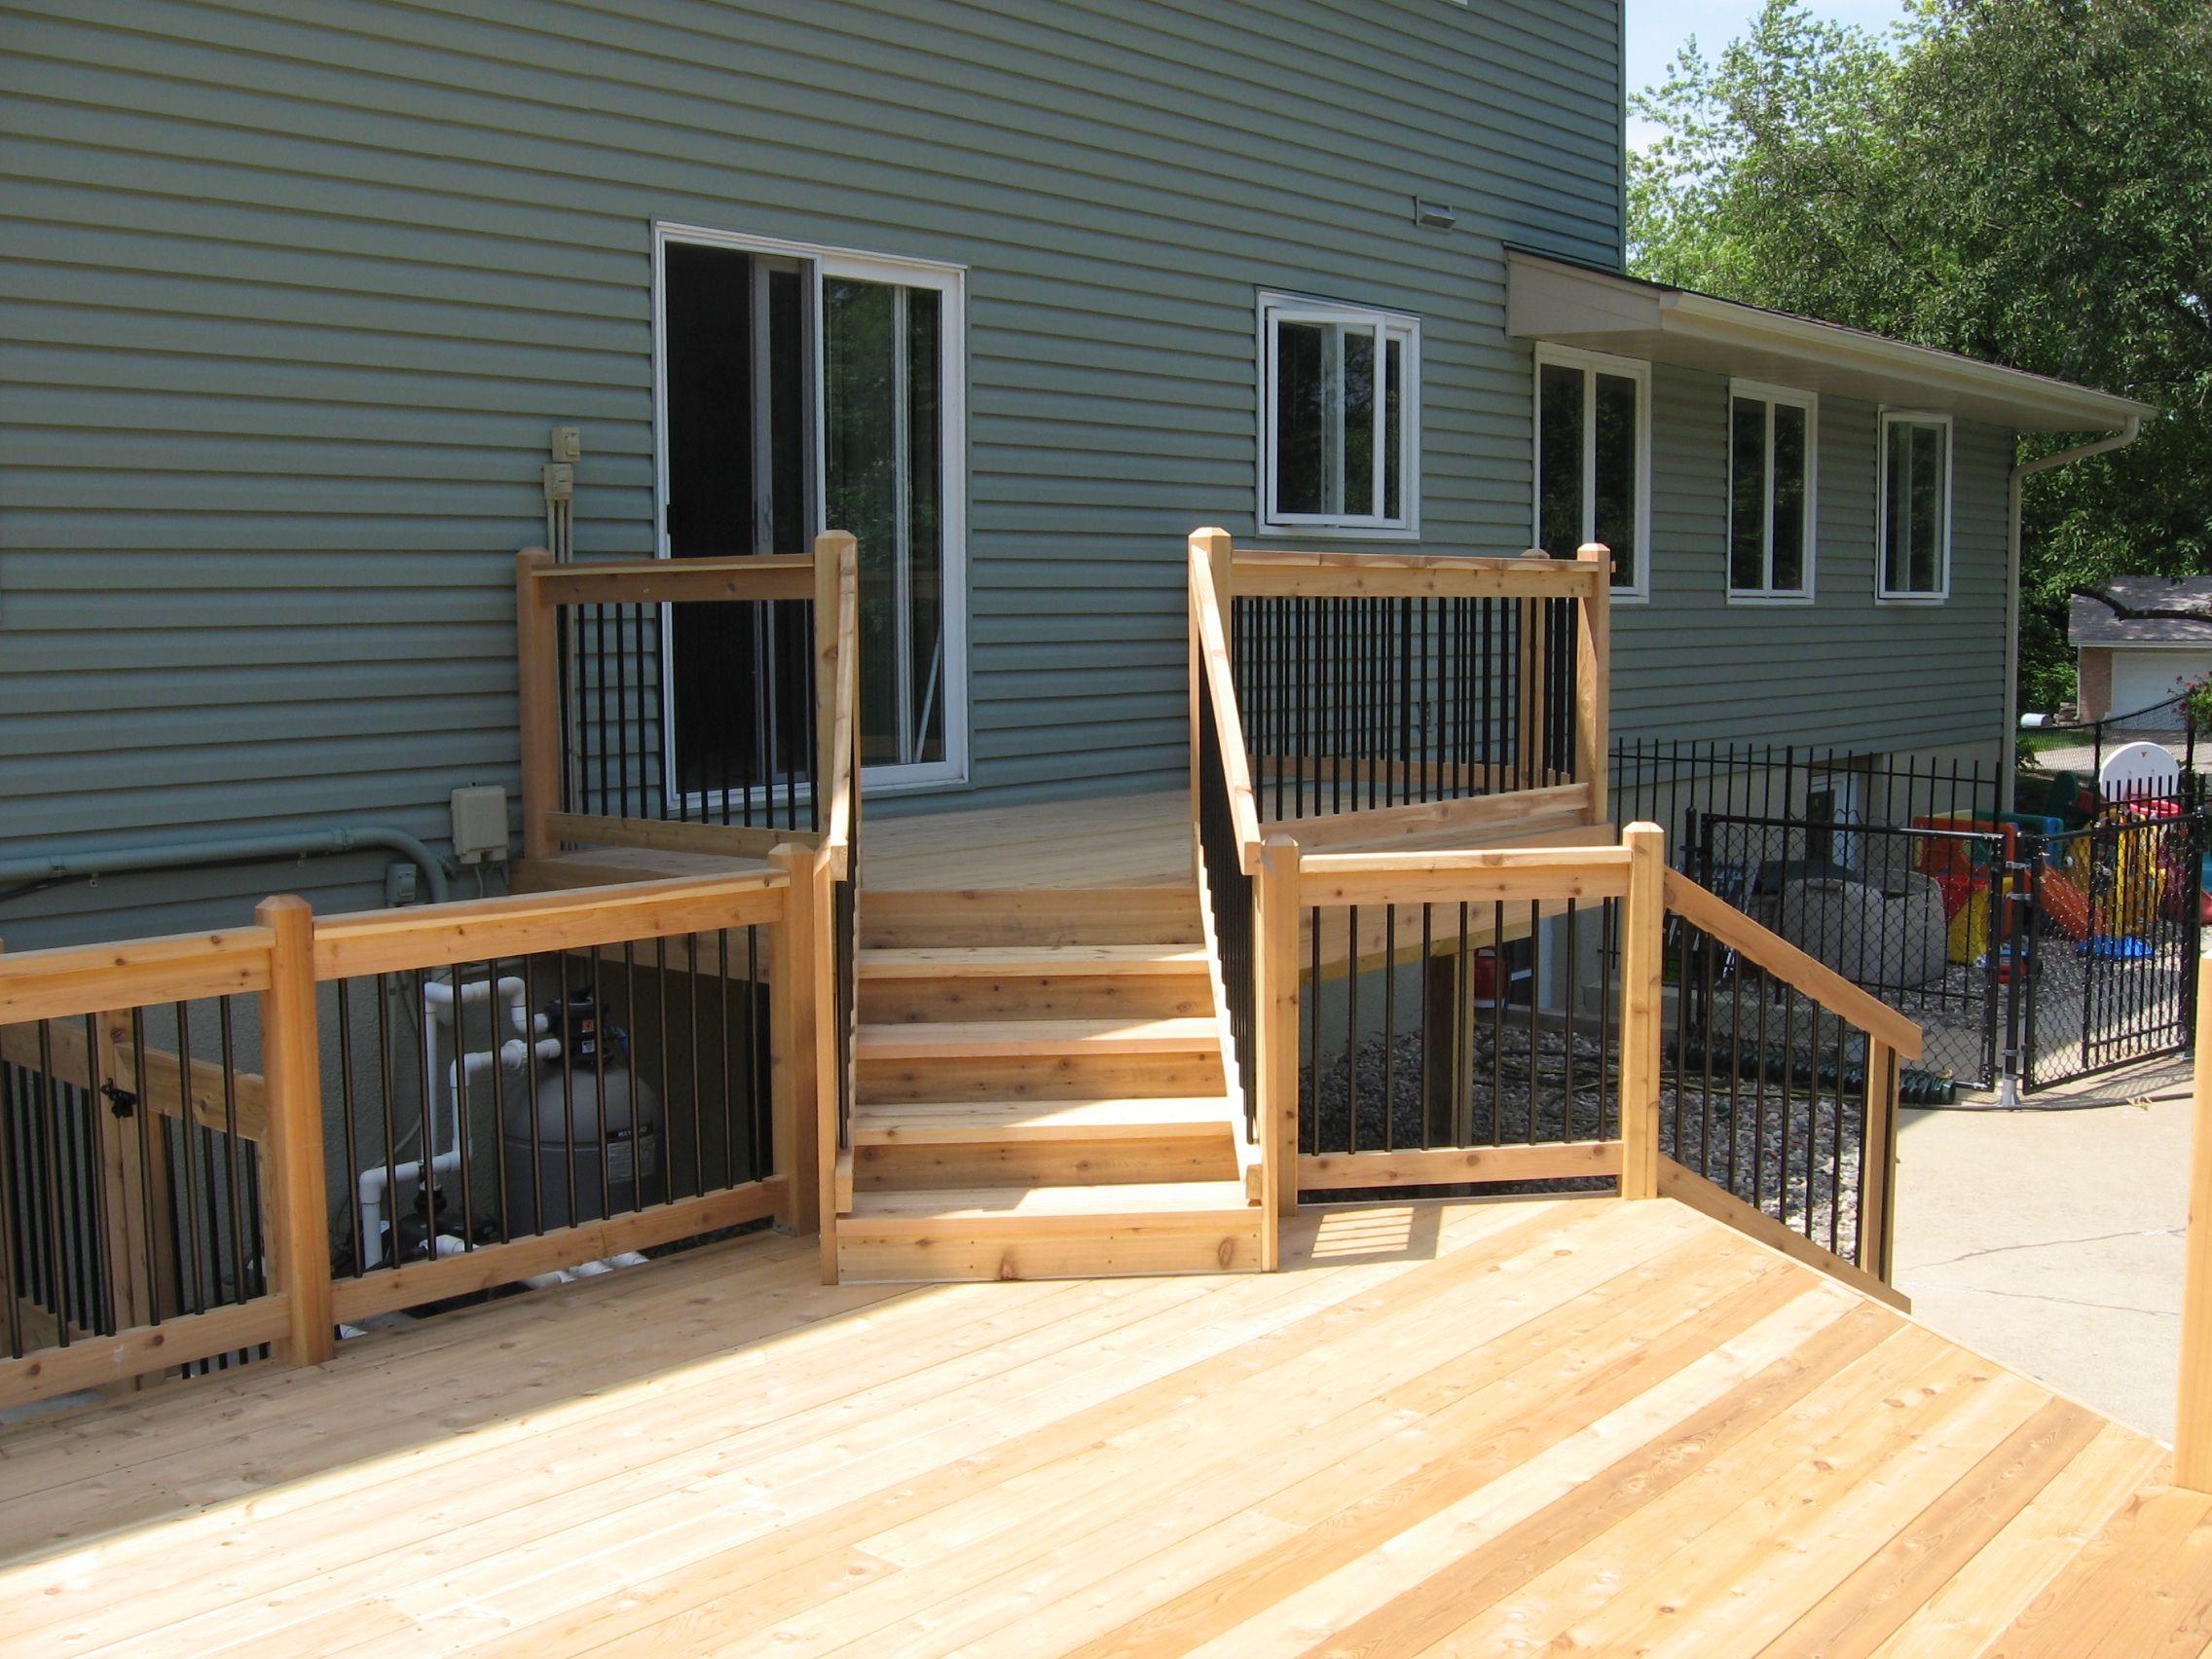 Modern home exterior design with stunning aluminum deck railing modern home exterior design with stunning aluminum deck railing excellent aluminum deck railing with wooden baanklon Images